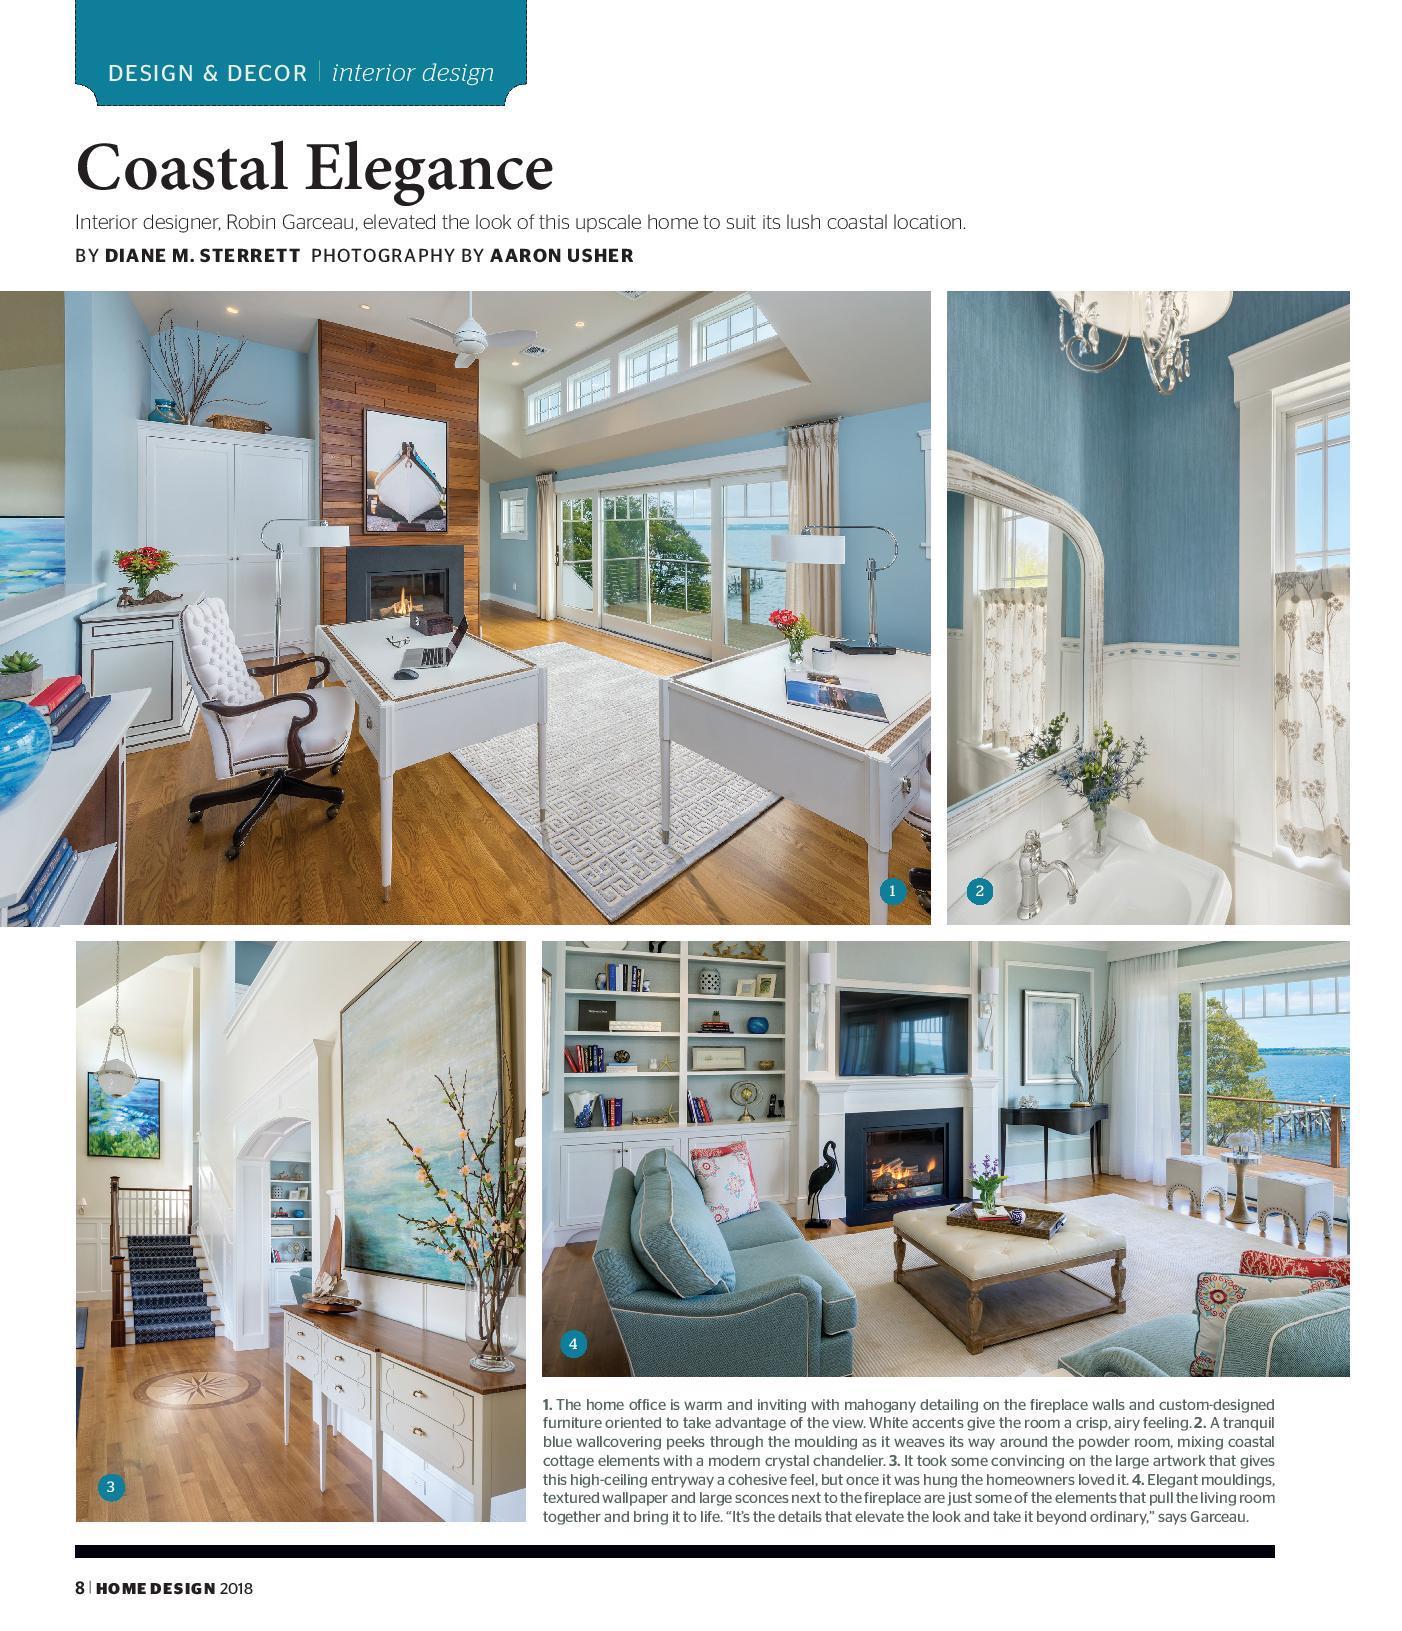 Robin Garceau featured in Rhode Island Home Design Magazine 2018 page 1